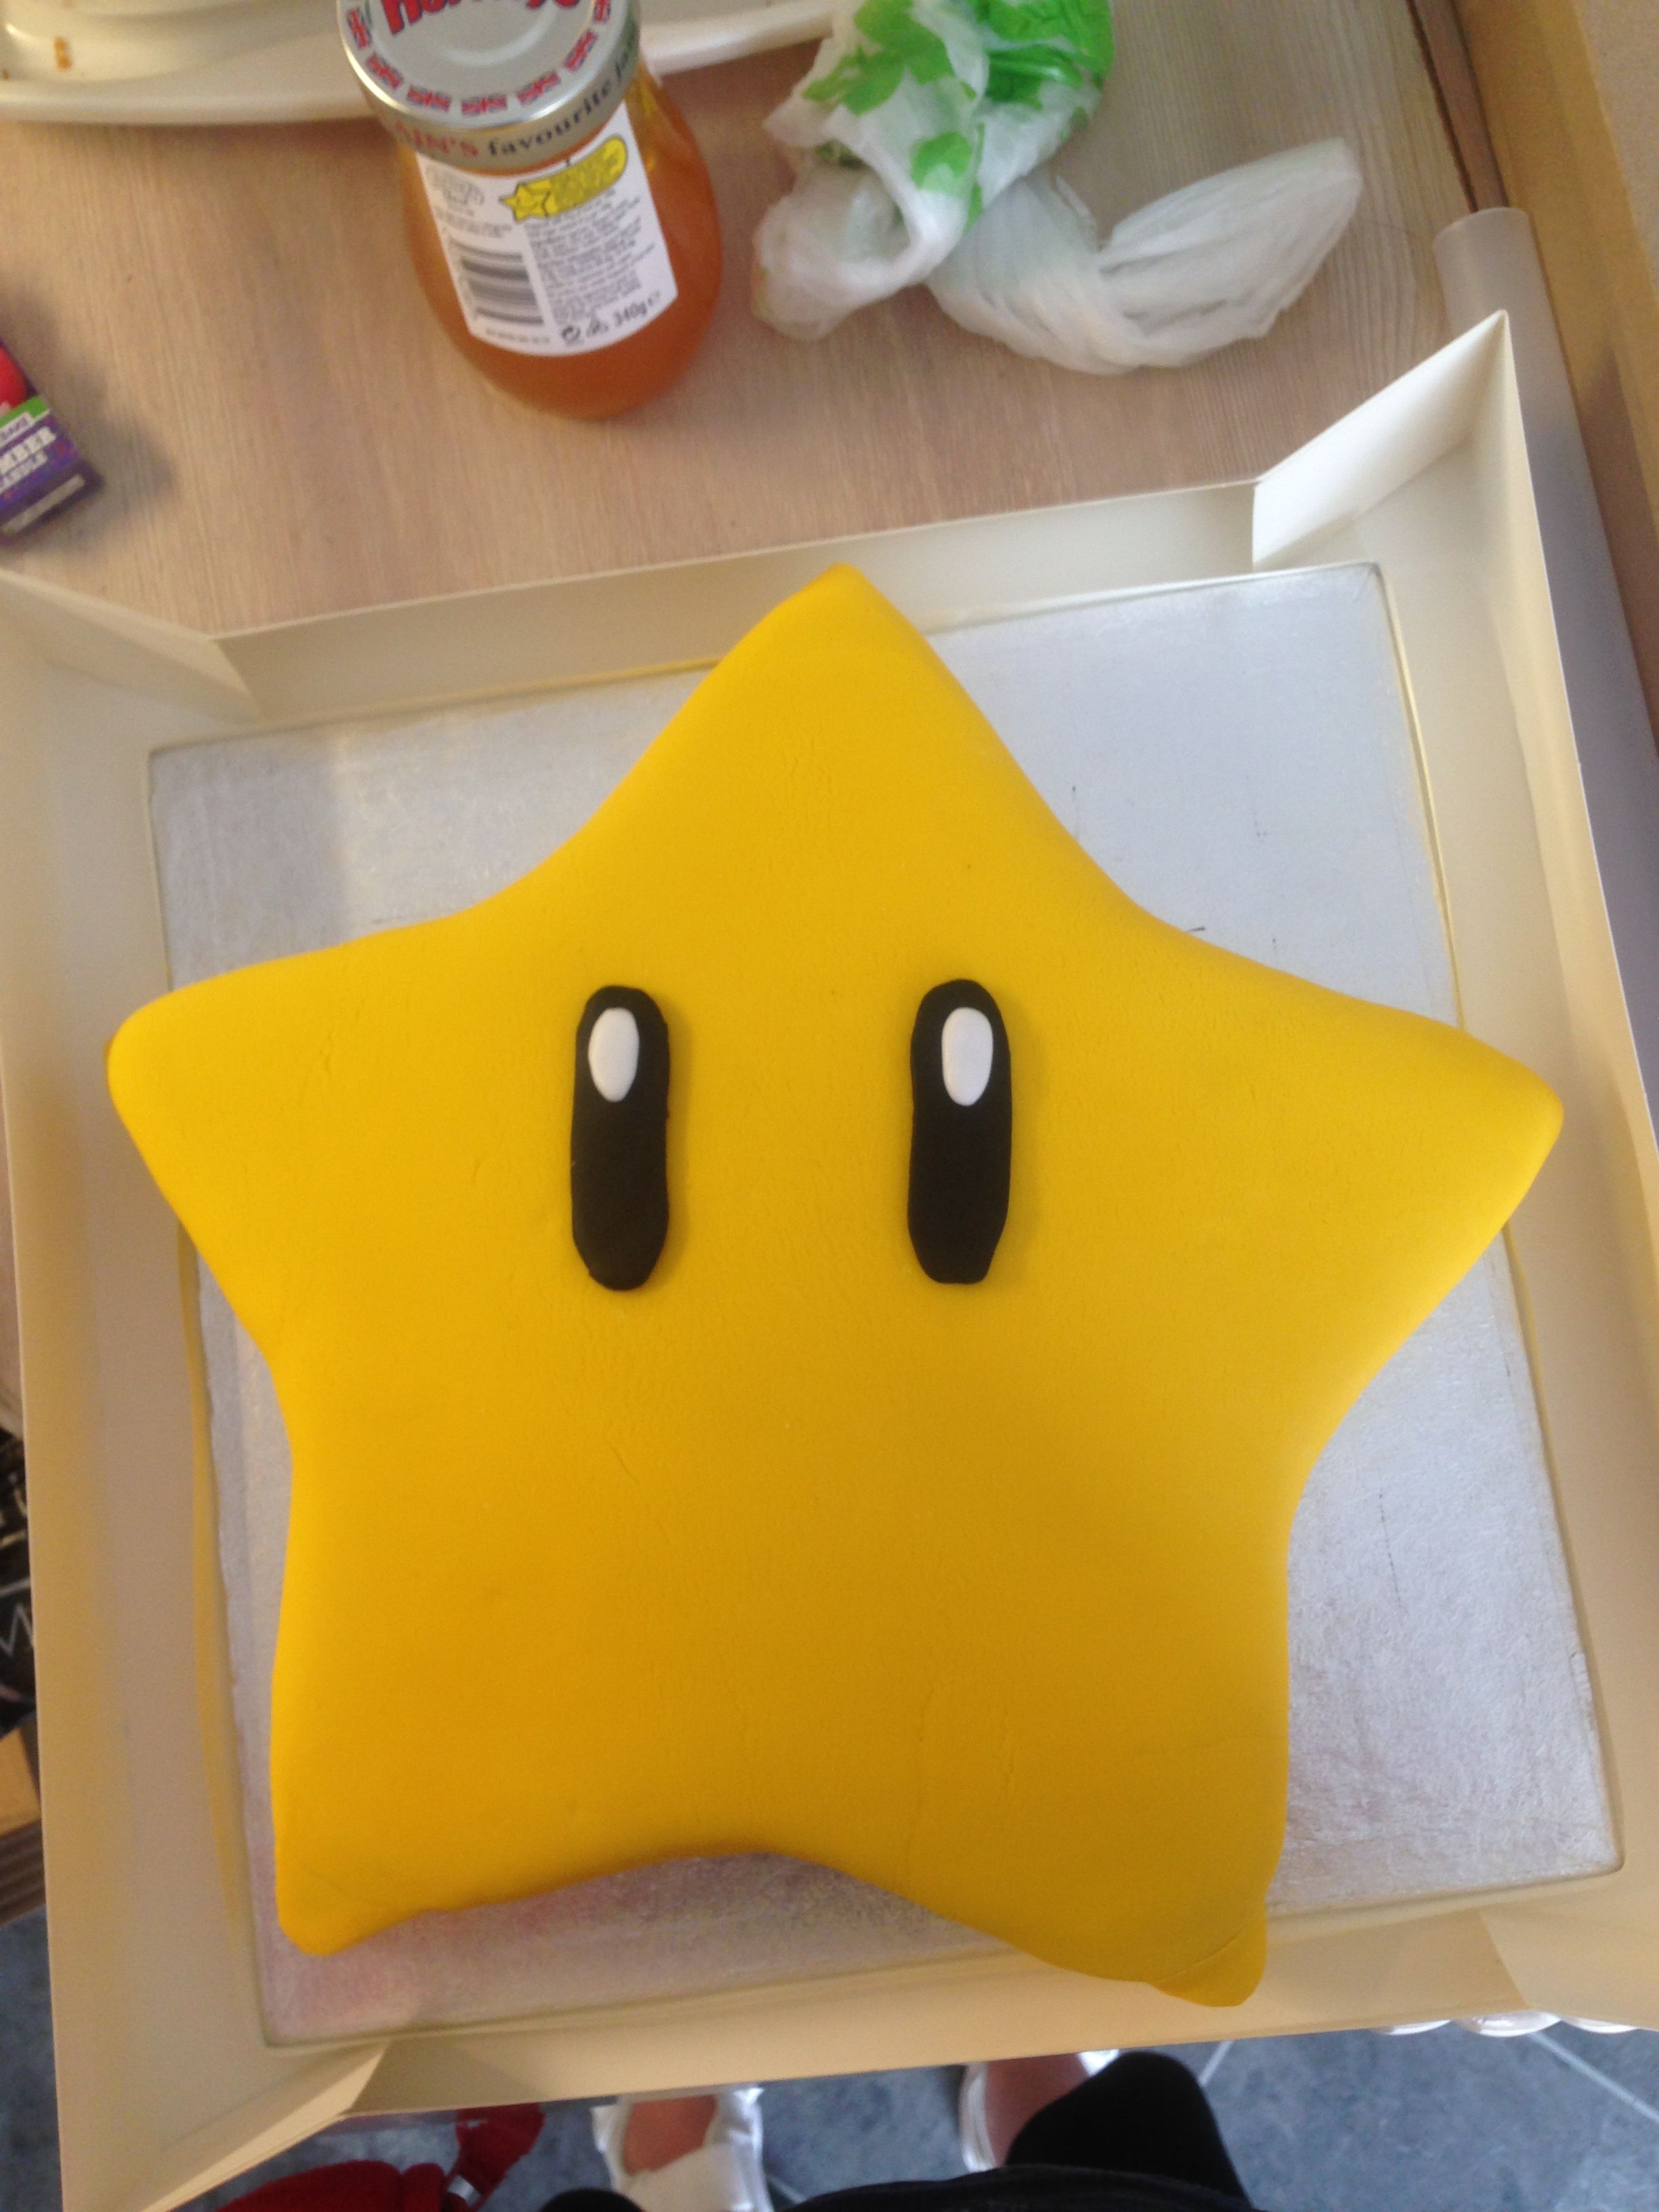 Super Mario Star Cake Avery In Pinterest Mario Super Jpg X Mario Star Cake Nerdy Nummies